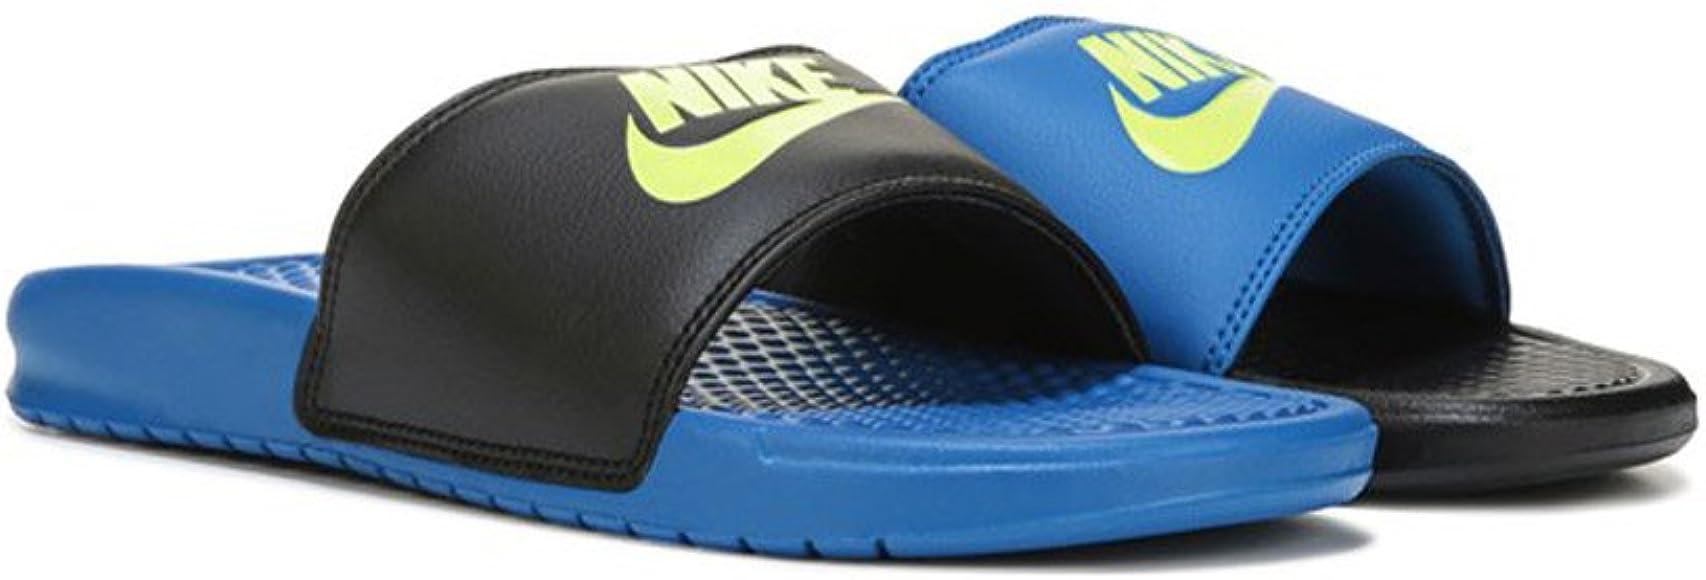 b0f28fb2f Amazon.com | Nike Men's Benassi JDI Mismatch - Black/Volt-Blue Spark ...